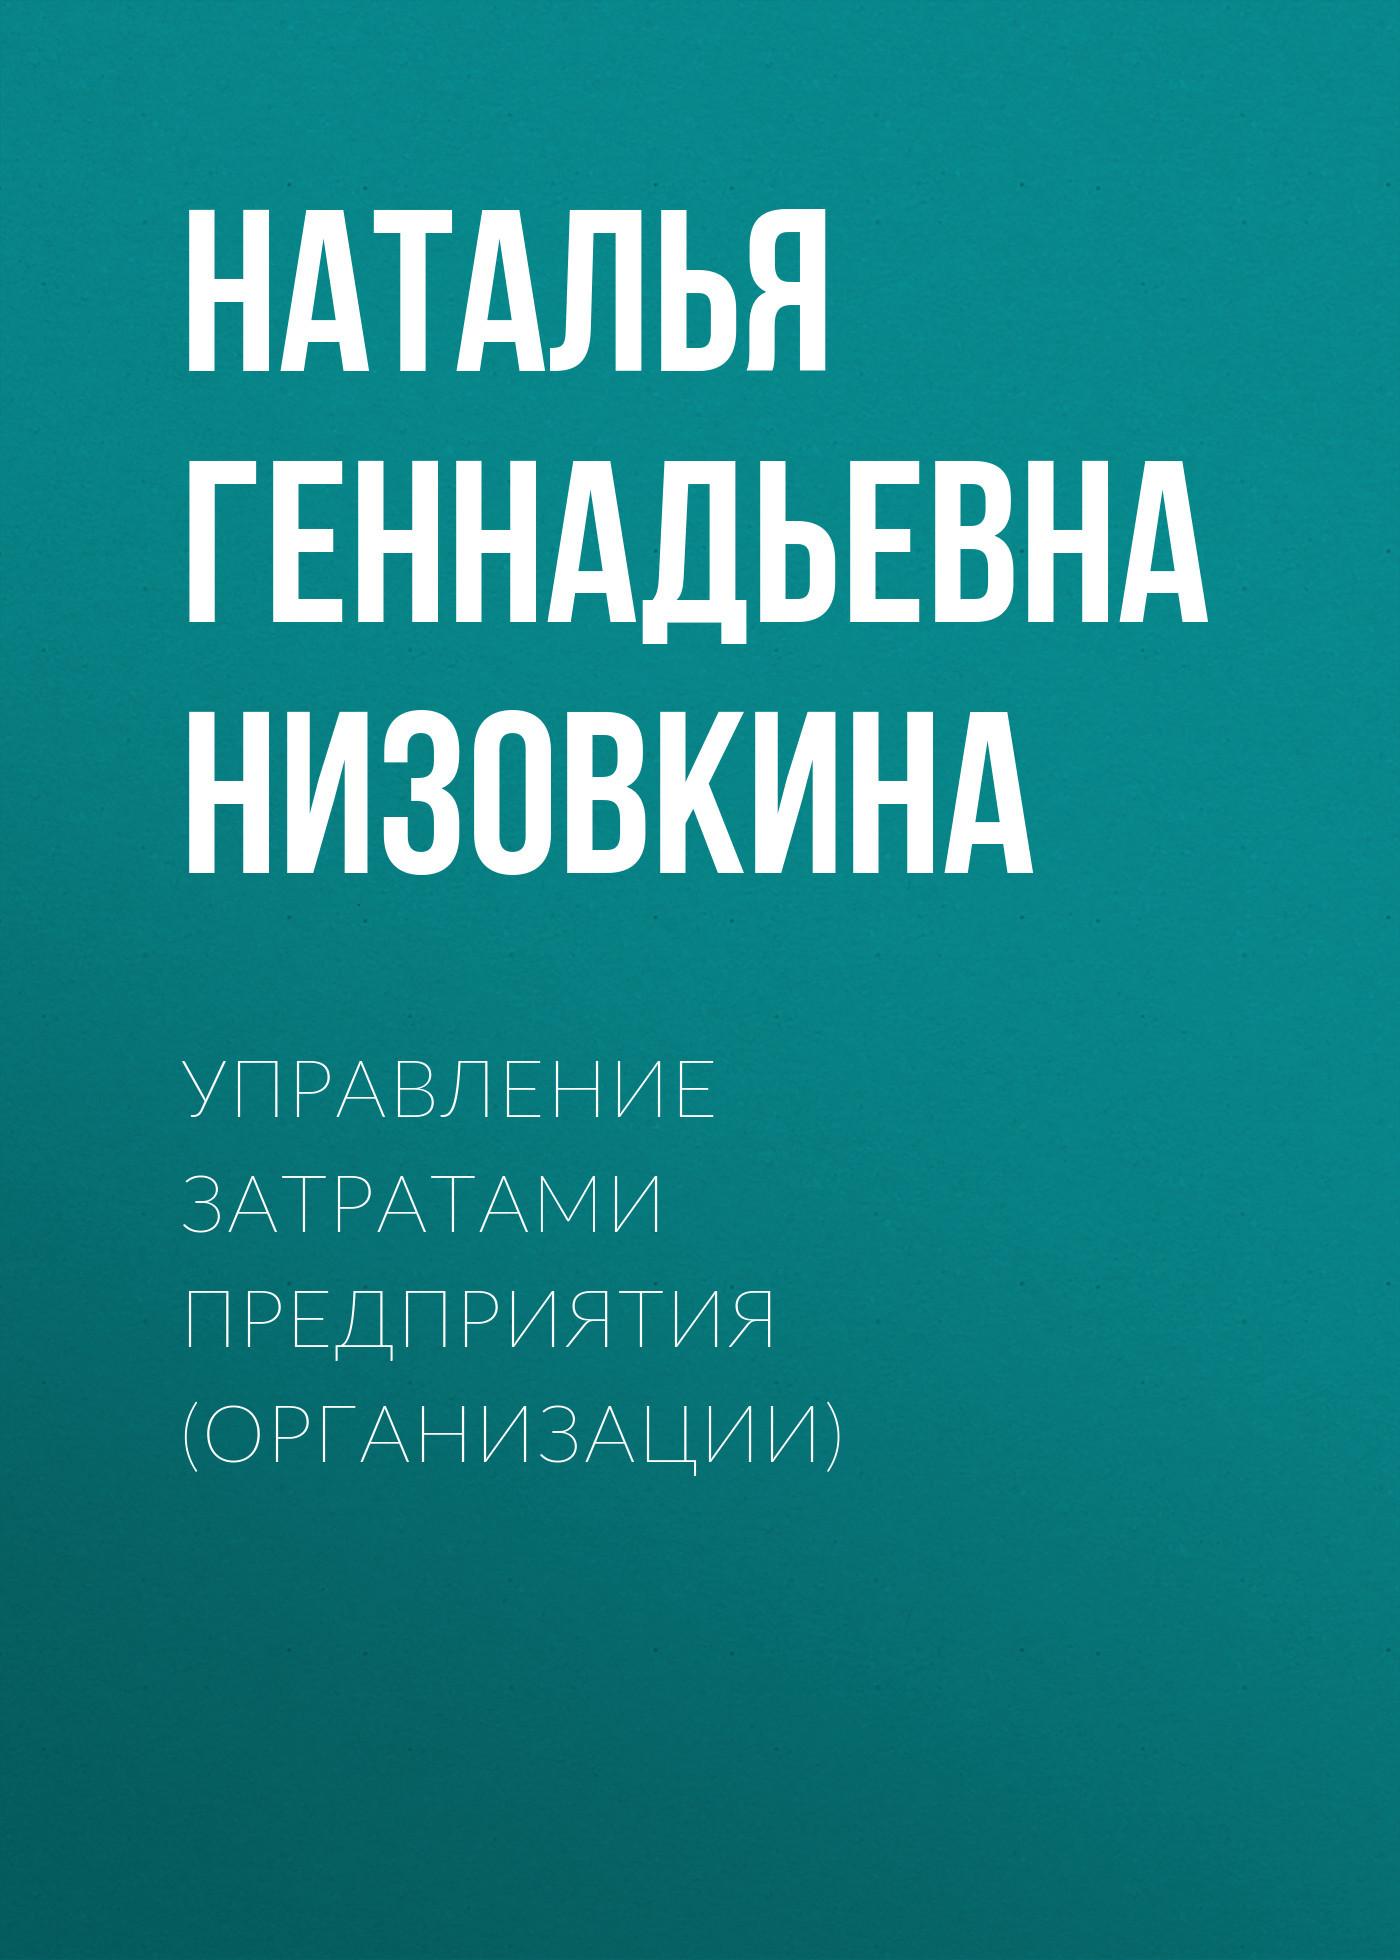 Наталья Геннадьевна Низовкина Управление затратами предприятия (организации)